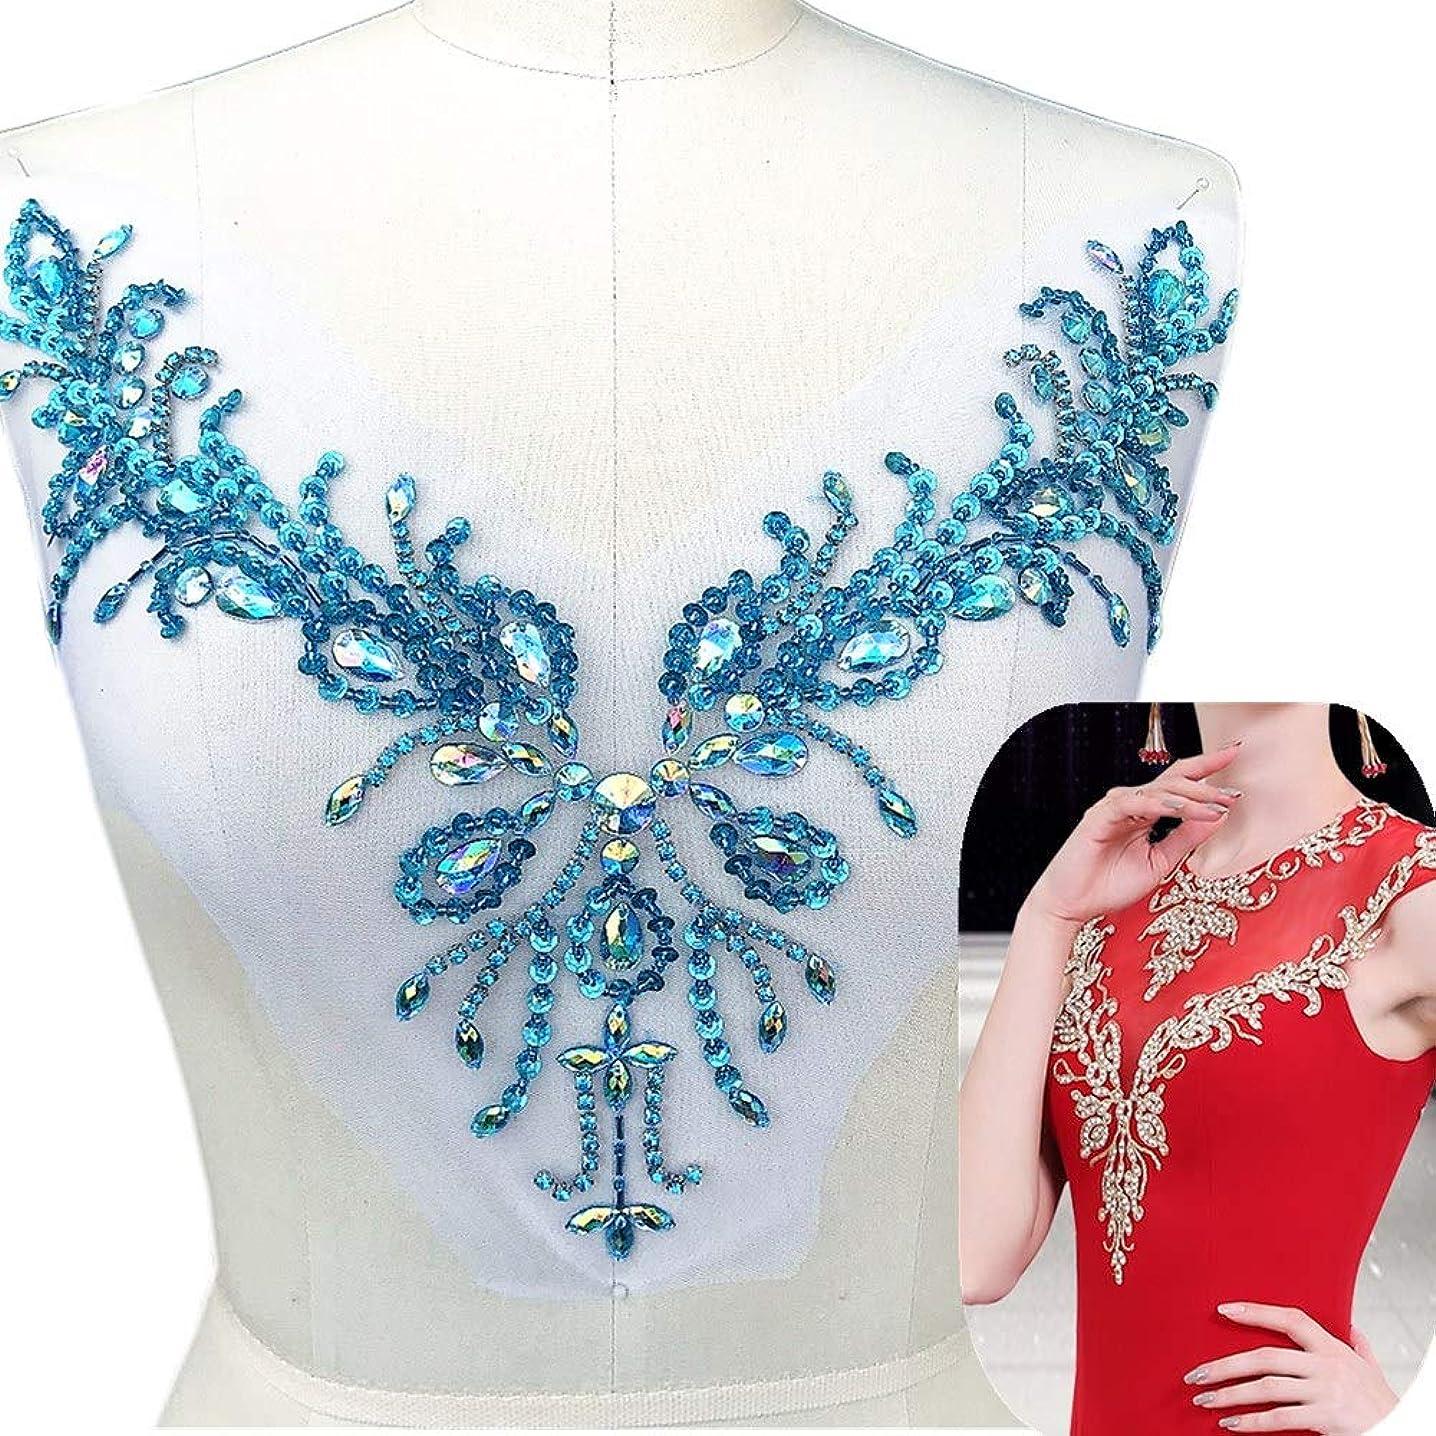 Sparkle Beaded V-Neck Blue AB Color Sew On Neckline Sequin Rhinestones Crystal Trim Bridal Applique Design Patch Sewing for Wedding Dresses DIY Craft 12x15 Inch (Light Blue)